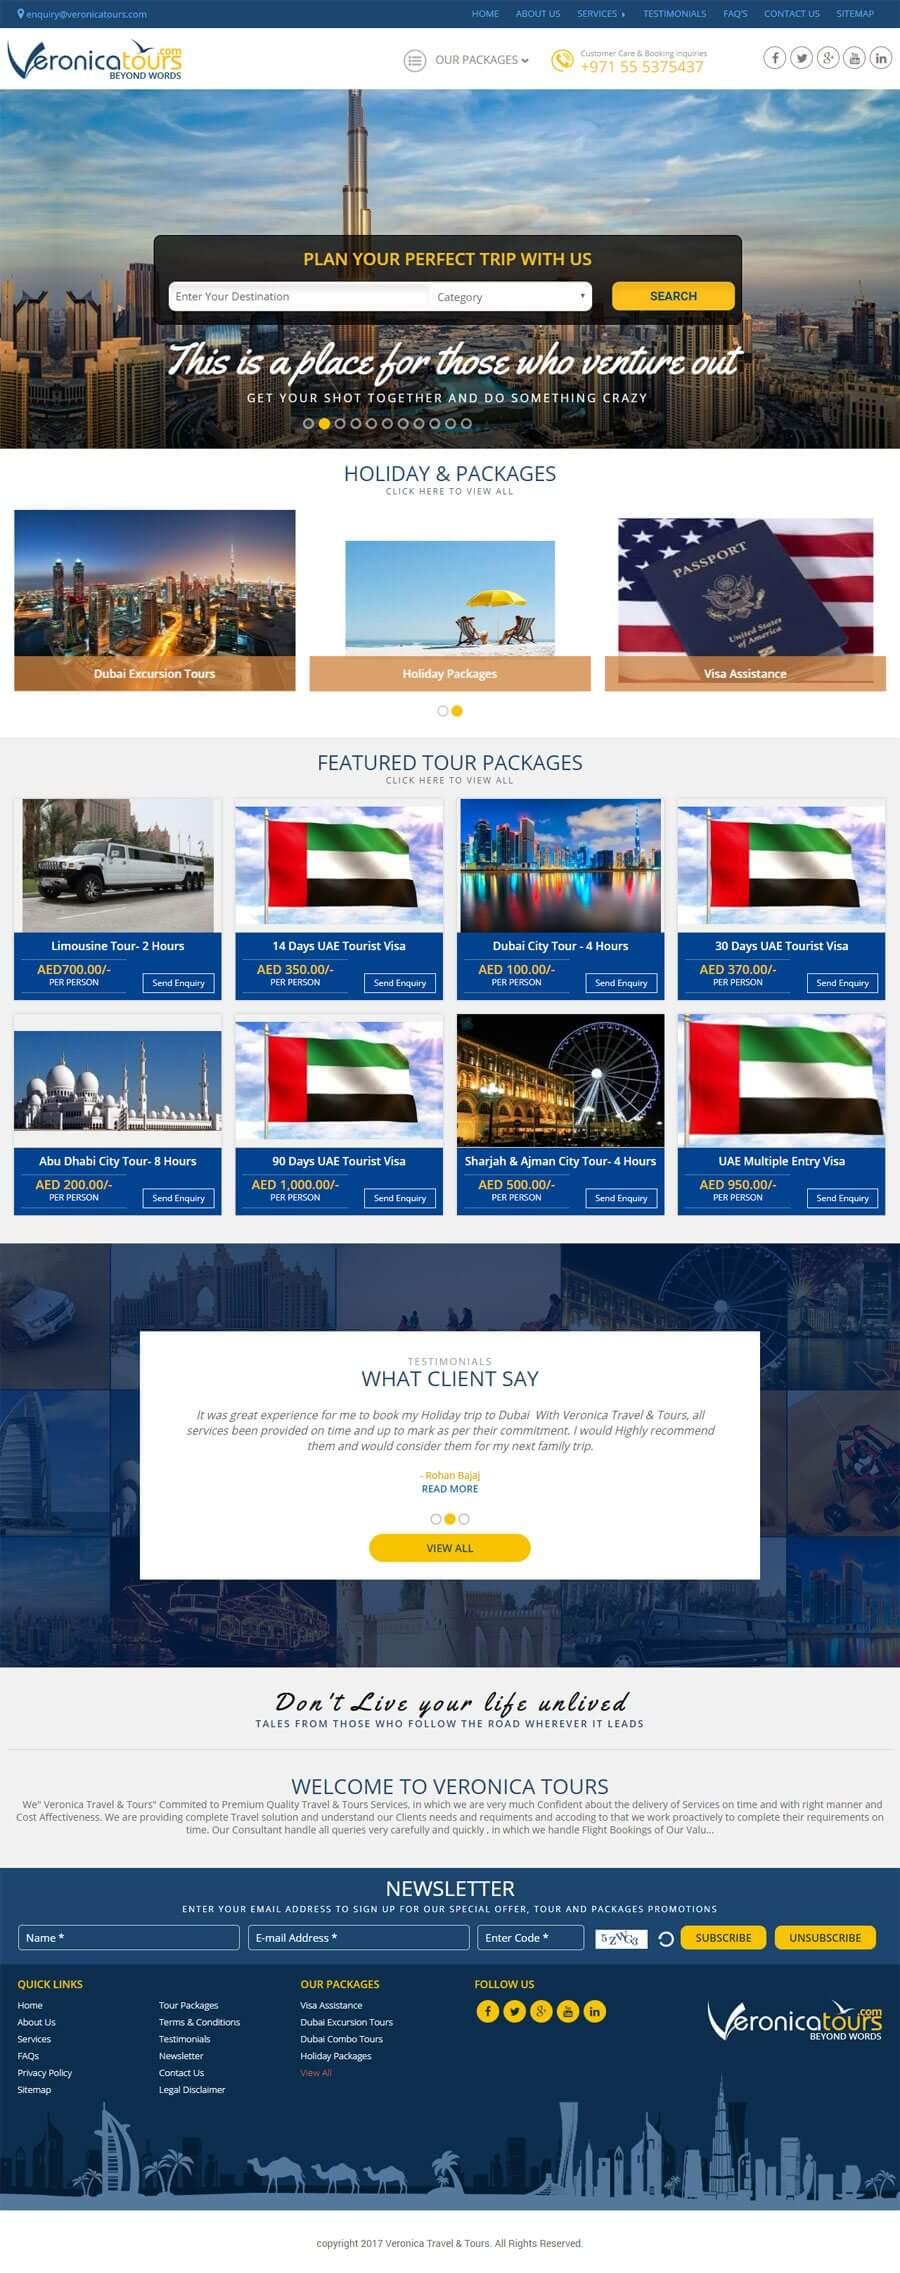 VERONICA TRAVEL & TOURS - Web Design Portfolio